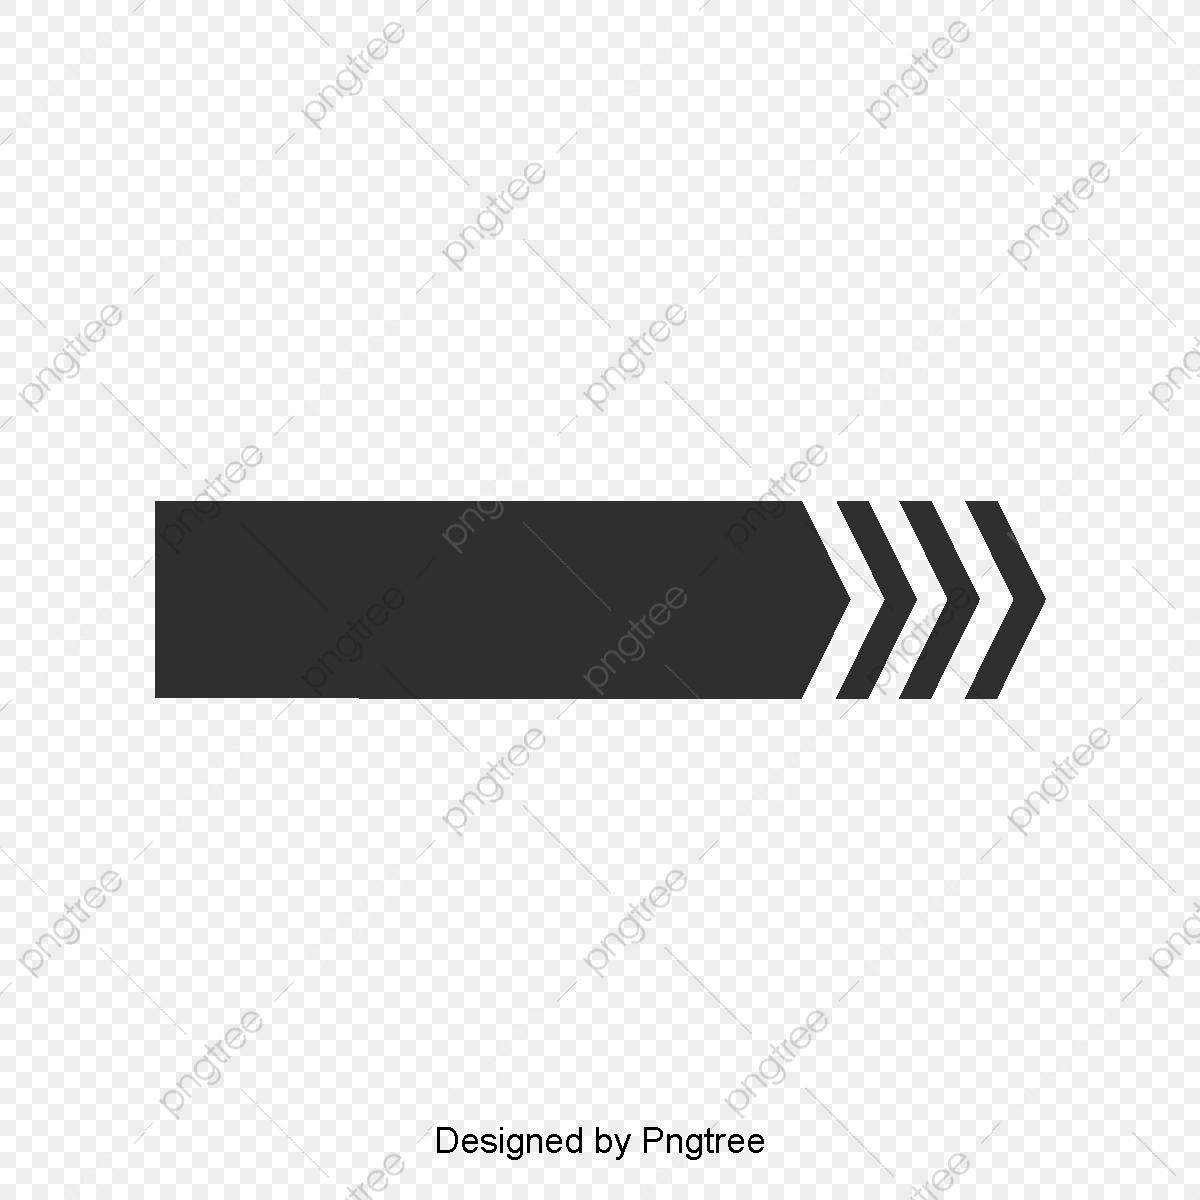 Ppt Design Vector Black Arrow Icon, Ppt Design, Black Arrow, Design.